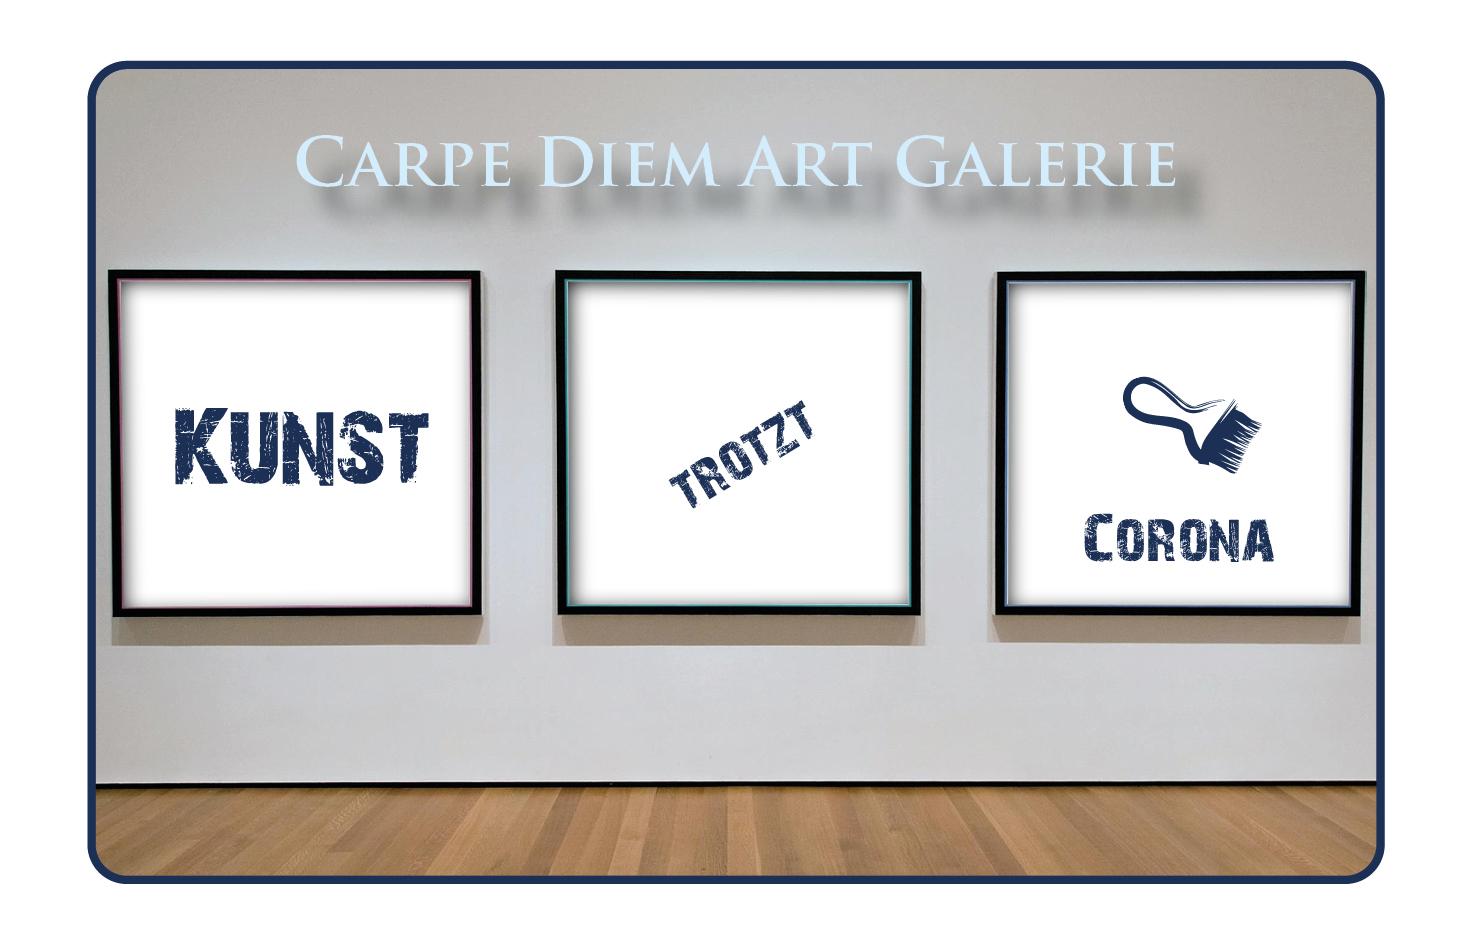 Privatschule Carpe Diem Kunst trotzt Corona